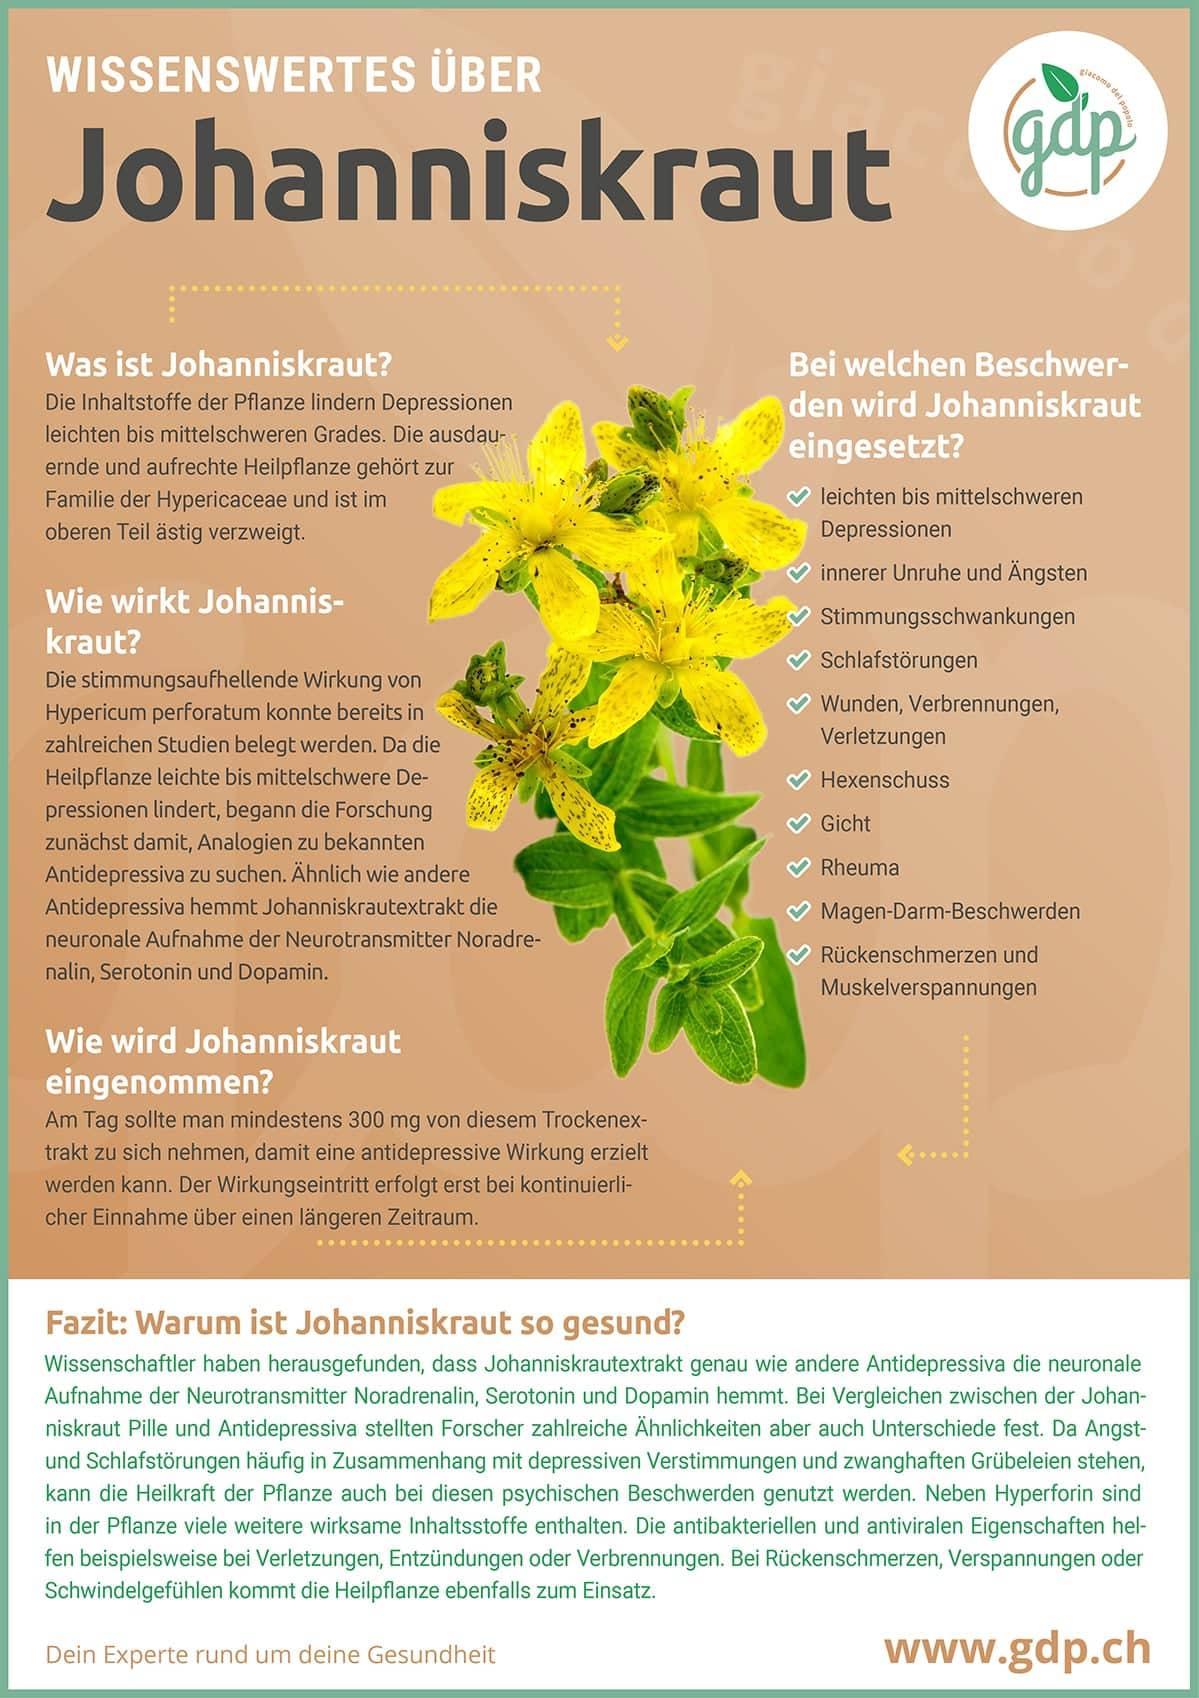 Johanniskraut gdp Infografik